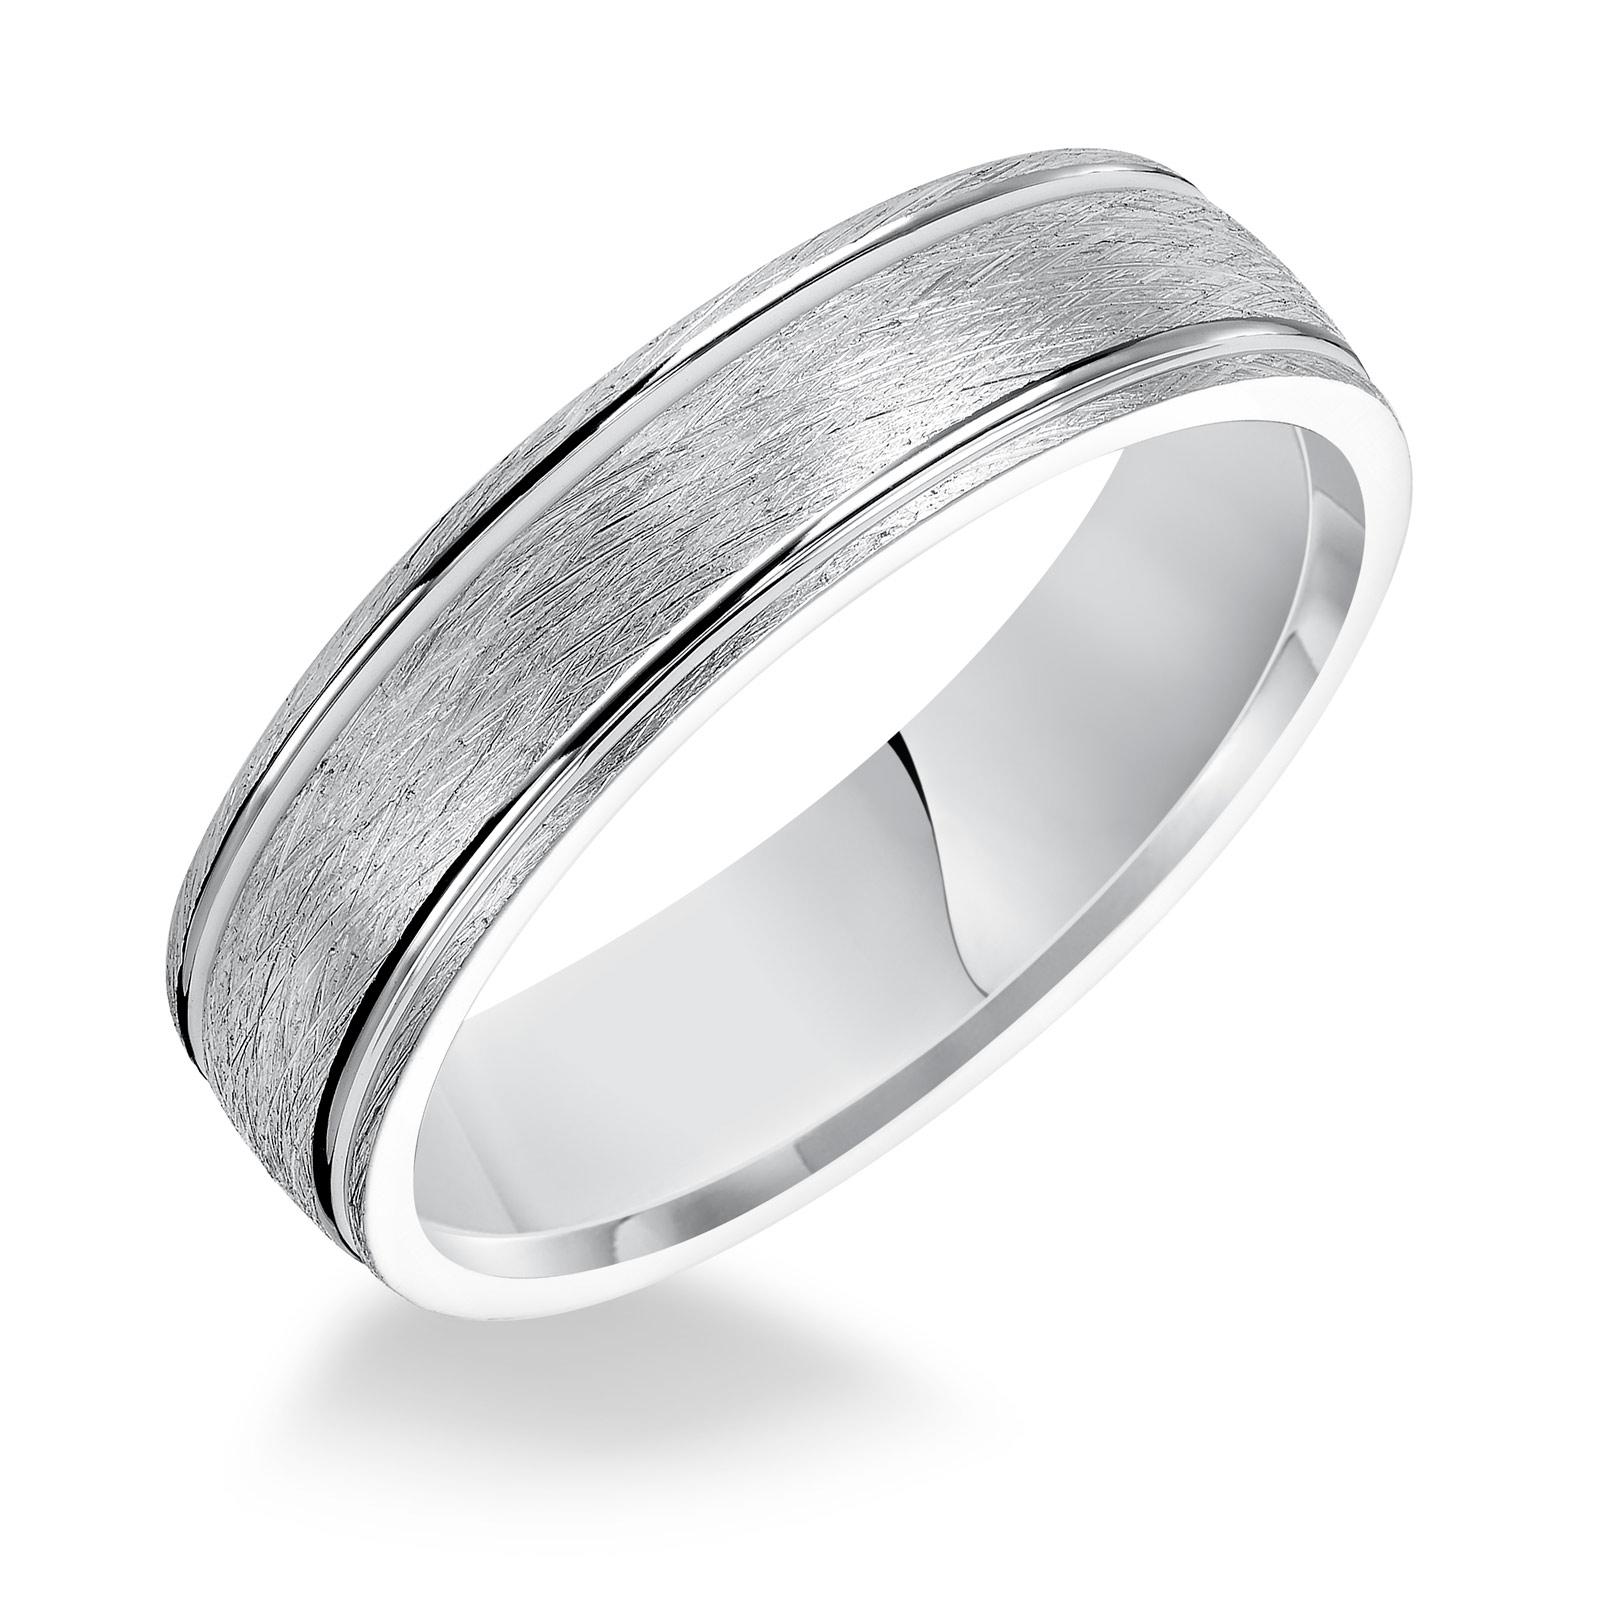 Goldman ring 11 10r4w6 g00 long island ny mens wedding for Long island wedding bands